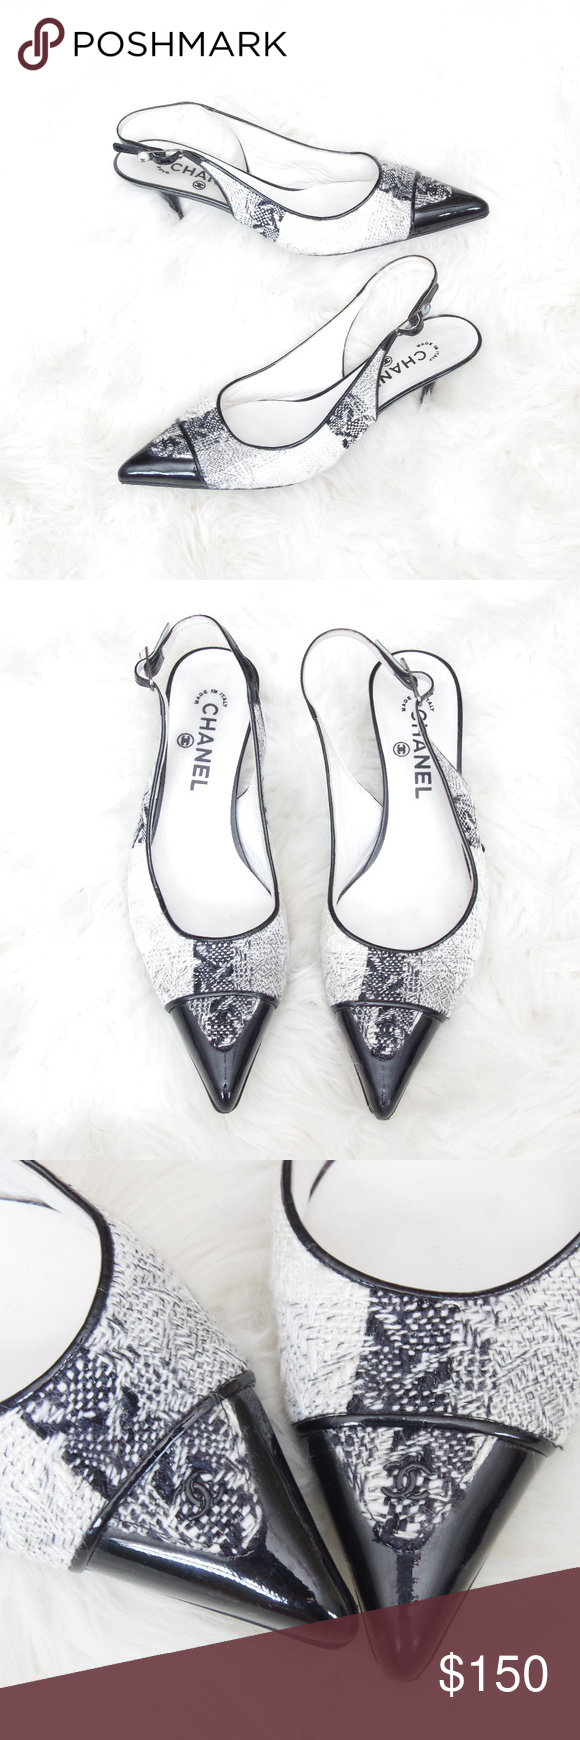 Chanel Vintage Tweed Kitten Heel Slingbacks Shoes Chanel Shoes Heels Vintage Chanel Kitten Heel Slingbacks